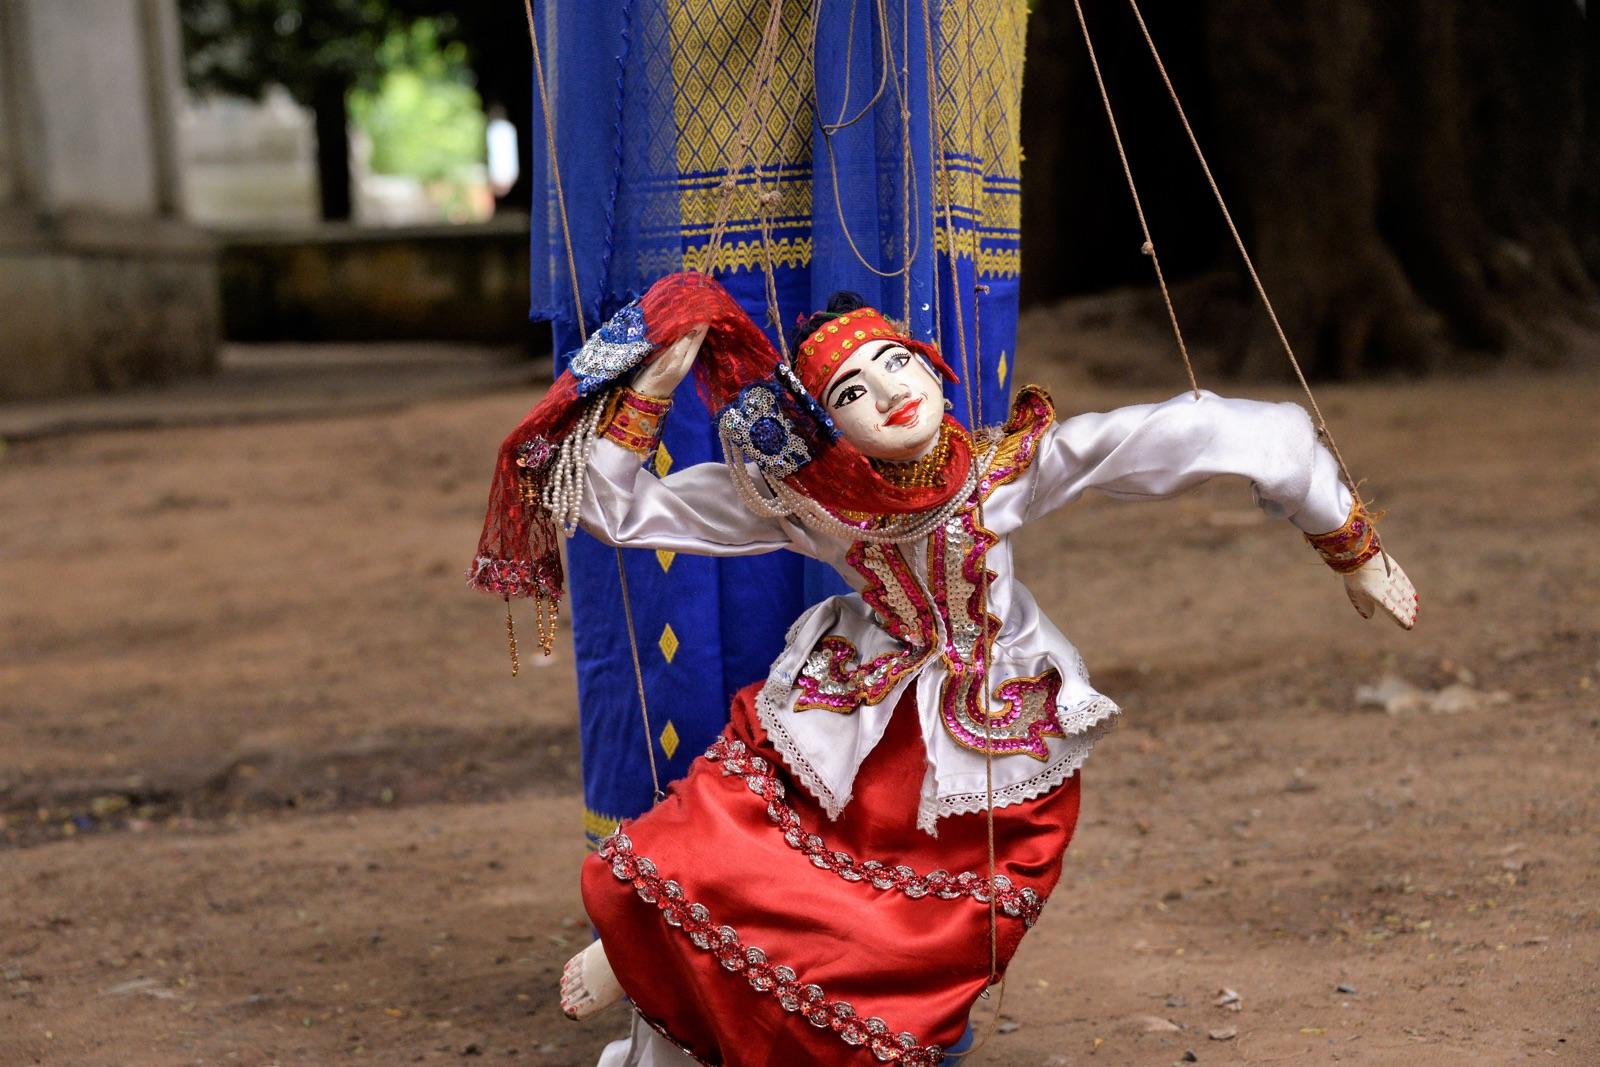 Myanmar Marionette Puppets (16) - New Naratif